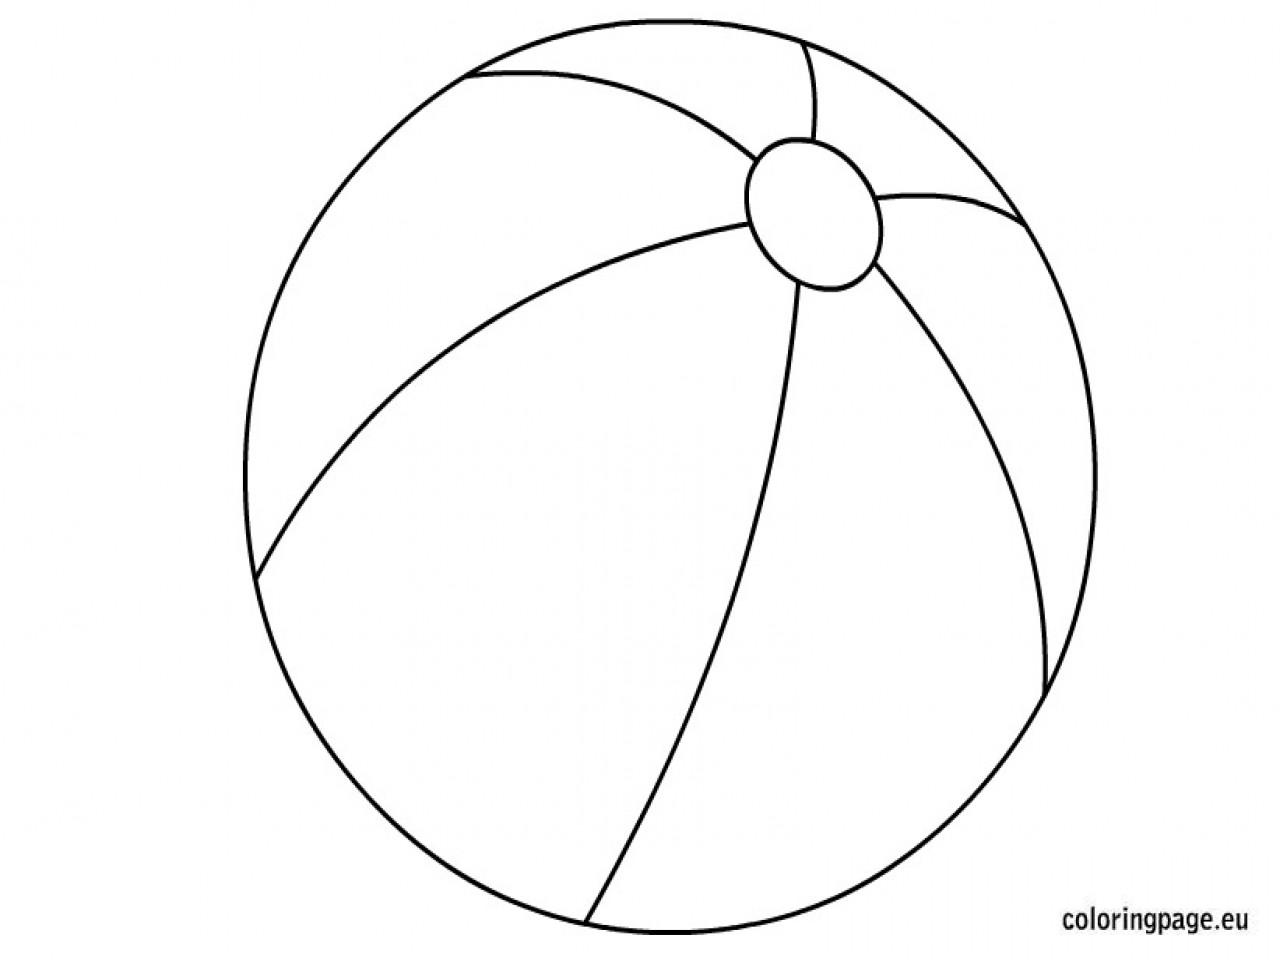 Trend beach ball coloring. Beachball clipart sphere object